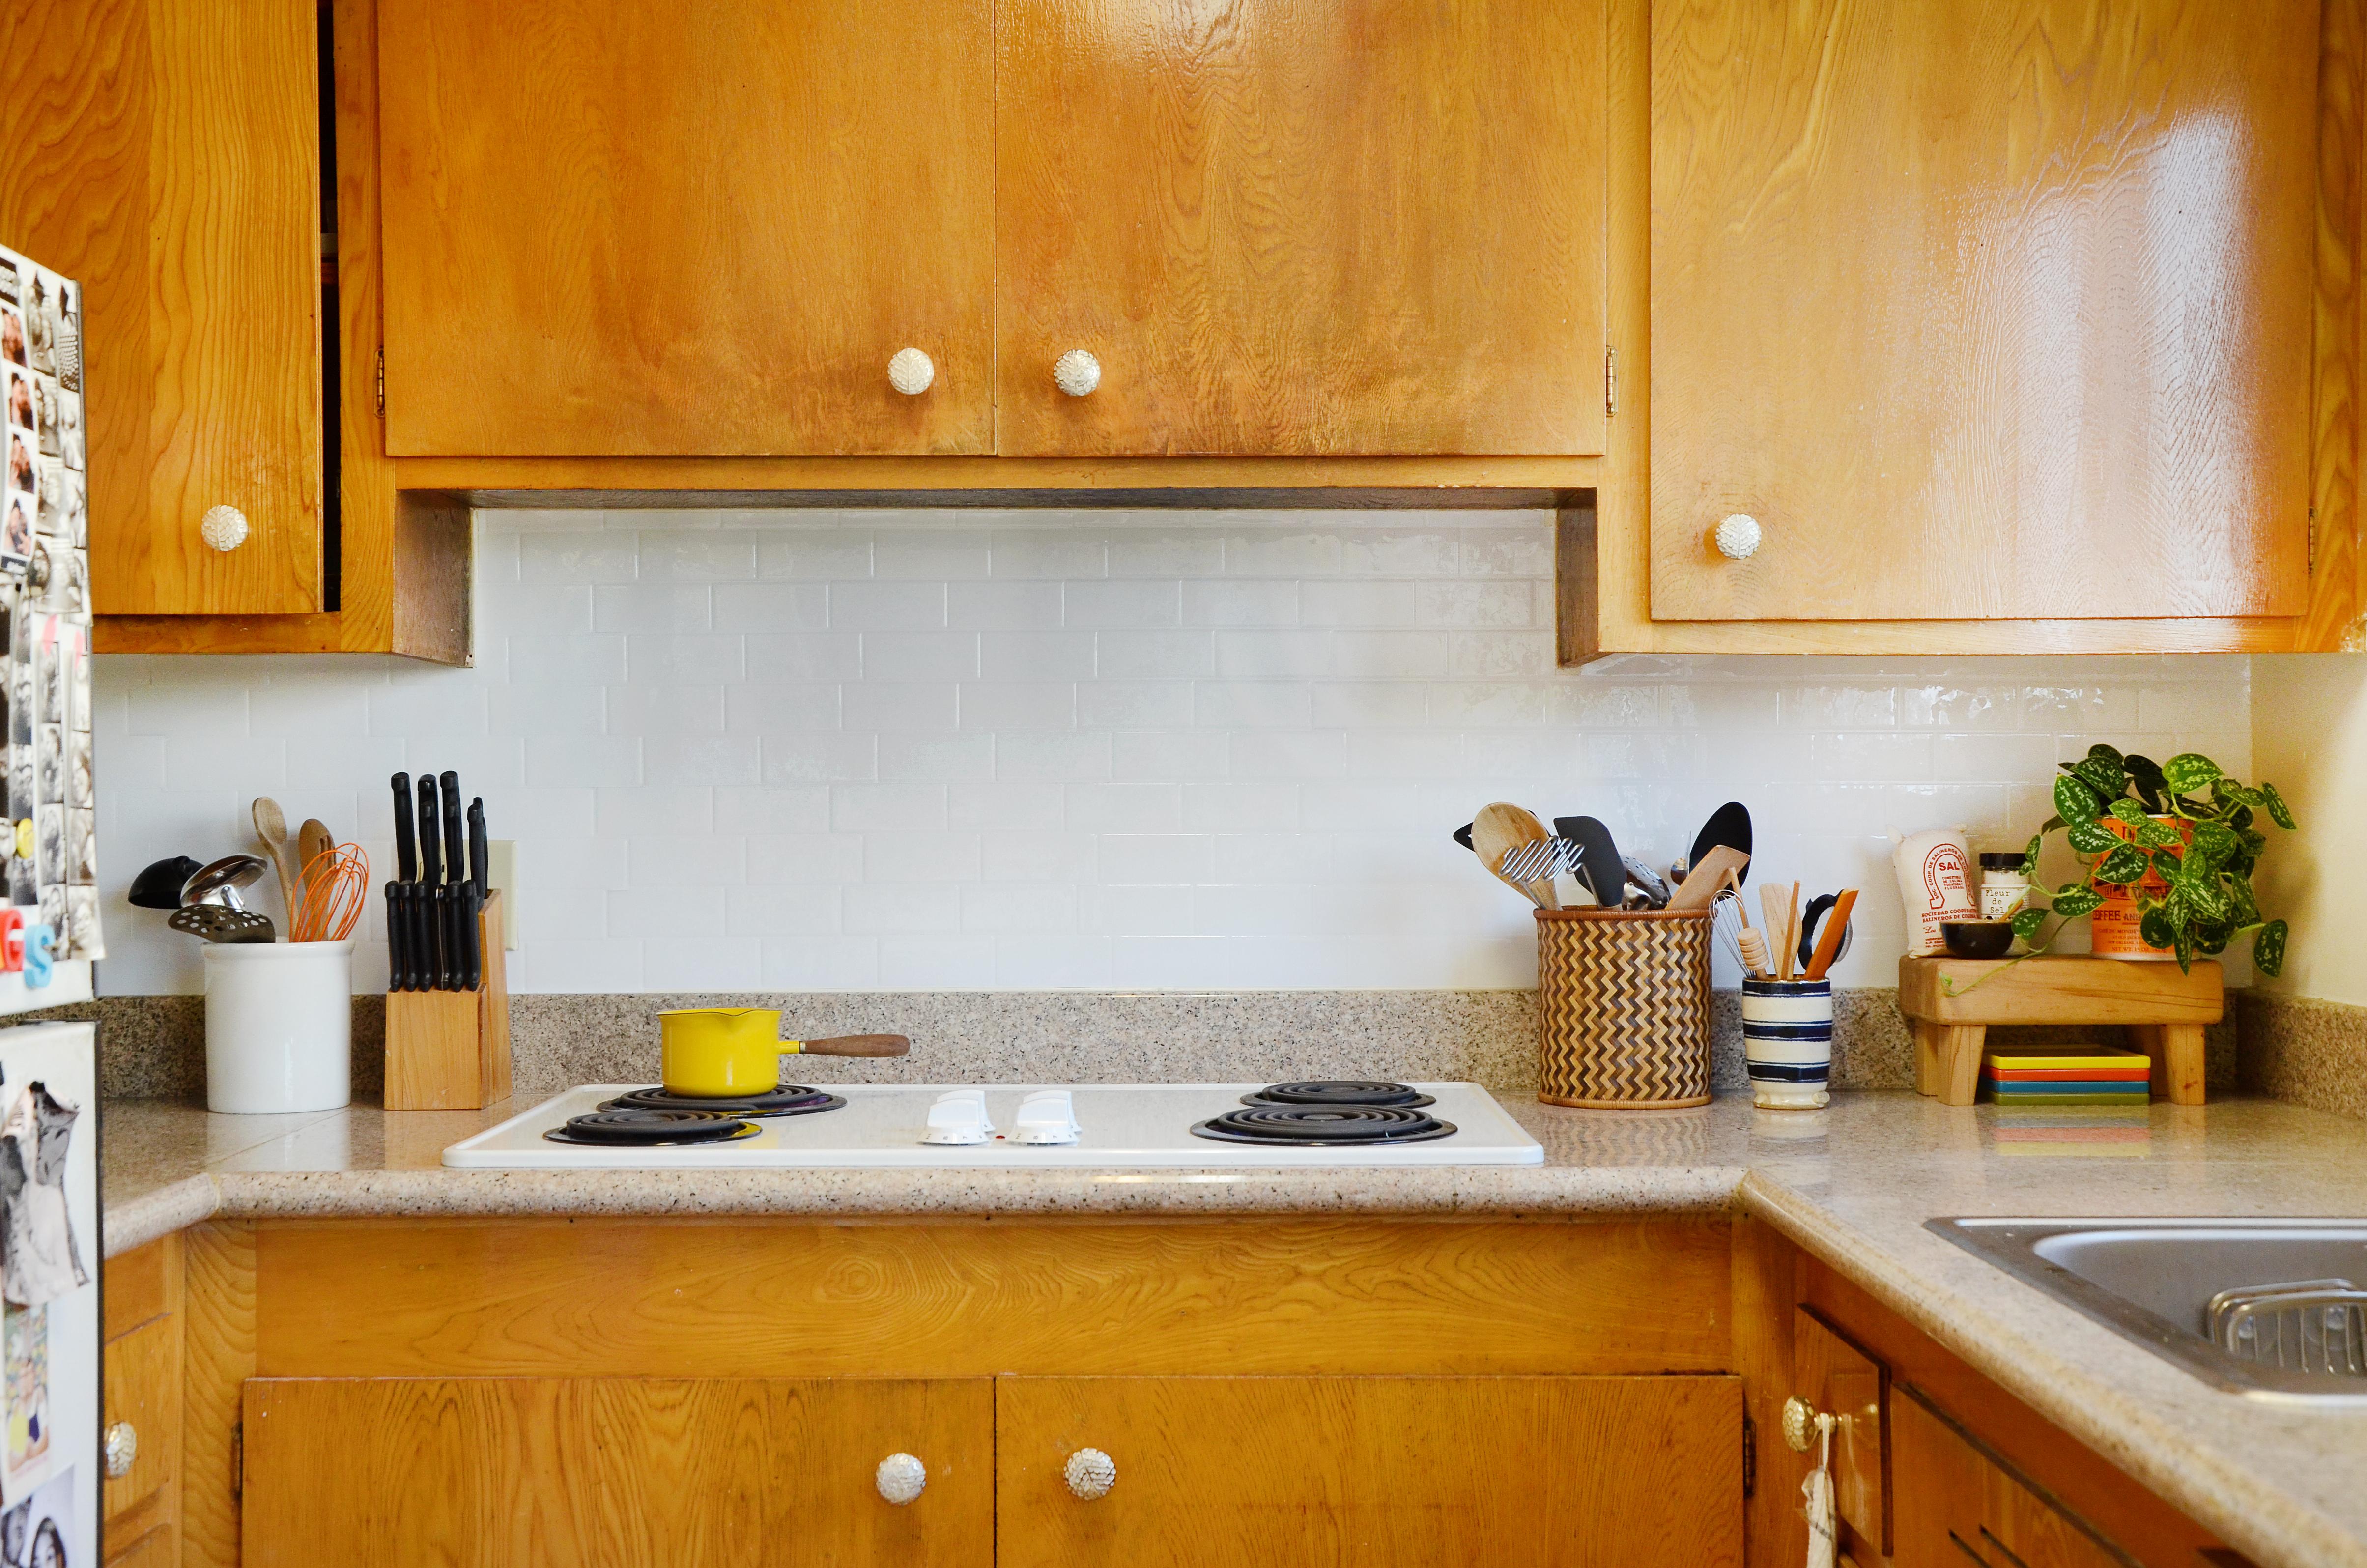 - Adhesive Smart Tiles Backsplash Review: How Renter-Friendly Is It